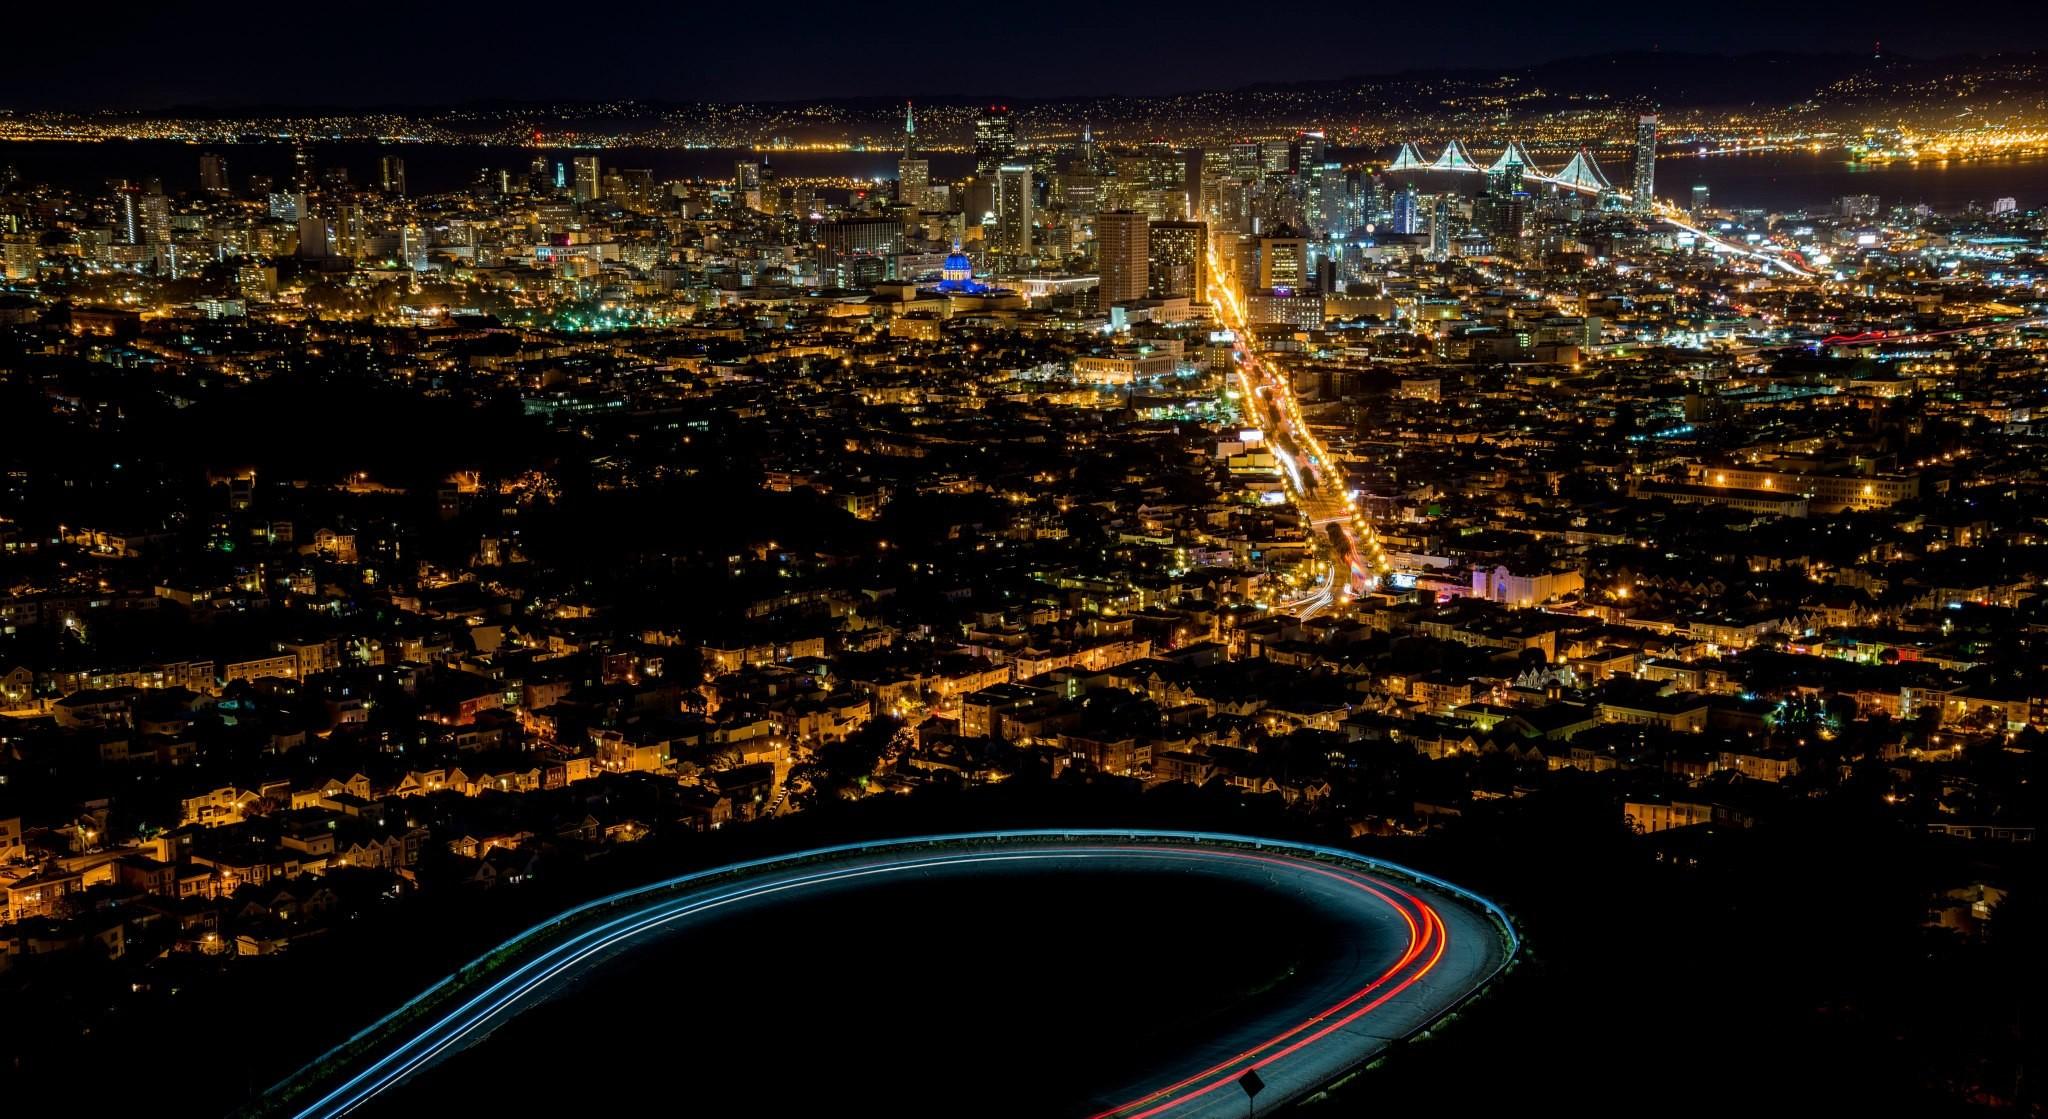 Twin Peaks San Francisco Night Wallpaper